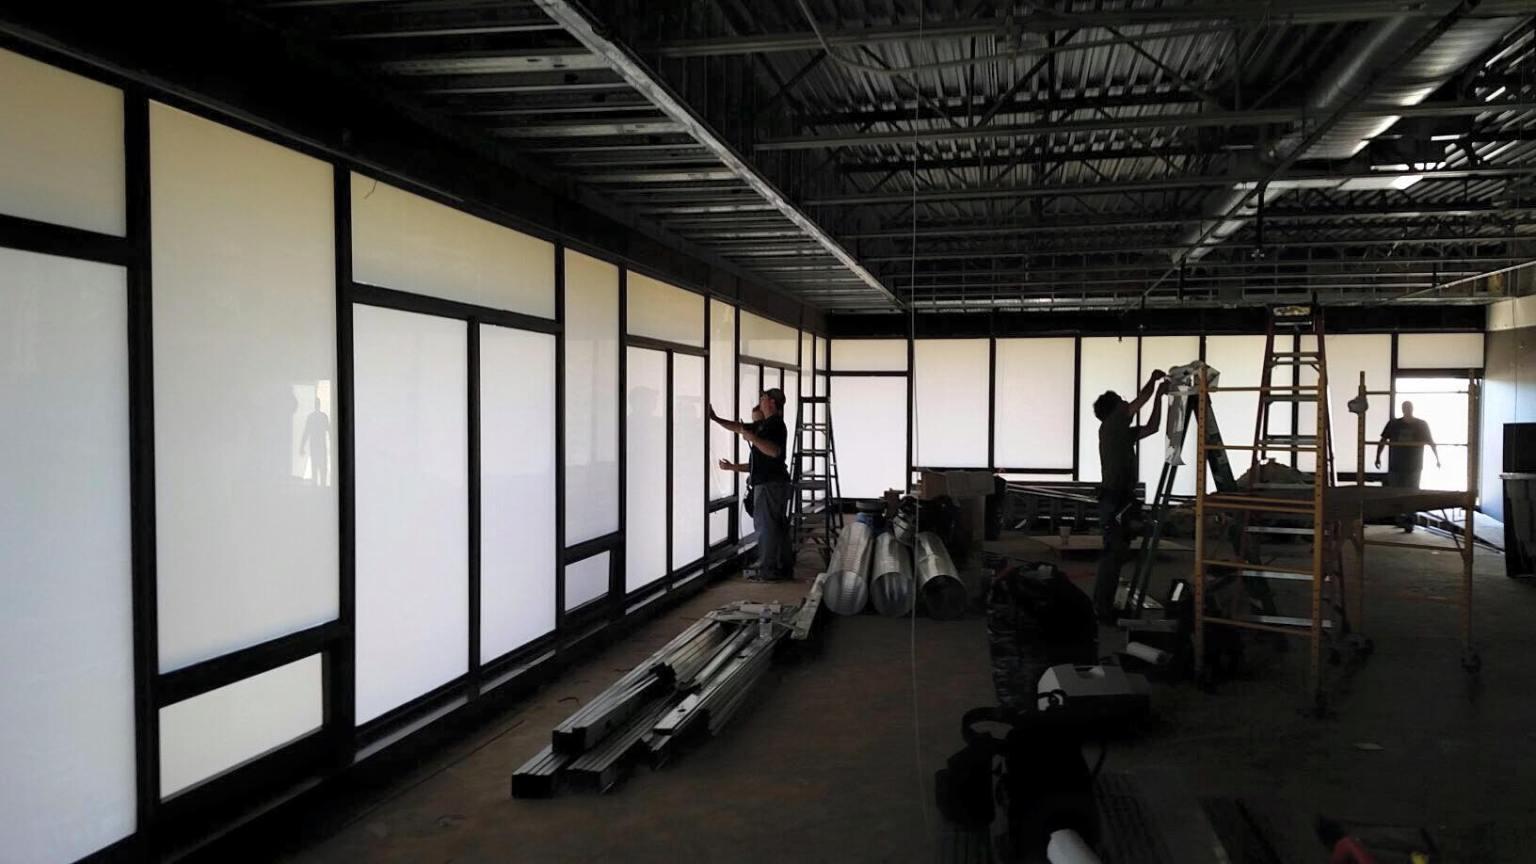 Decorative Window Film Conceals Framework, Walls and Shelving